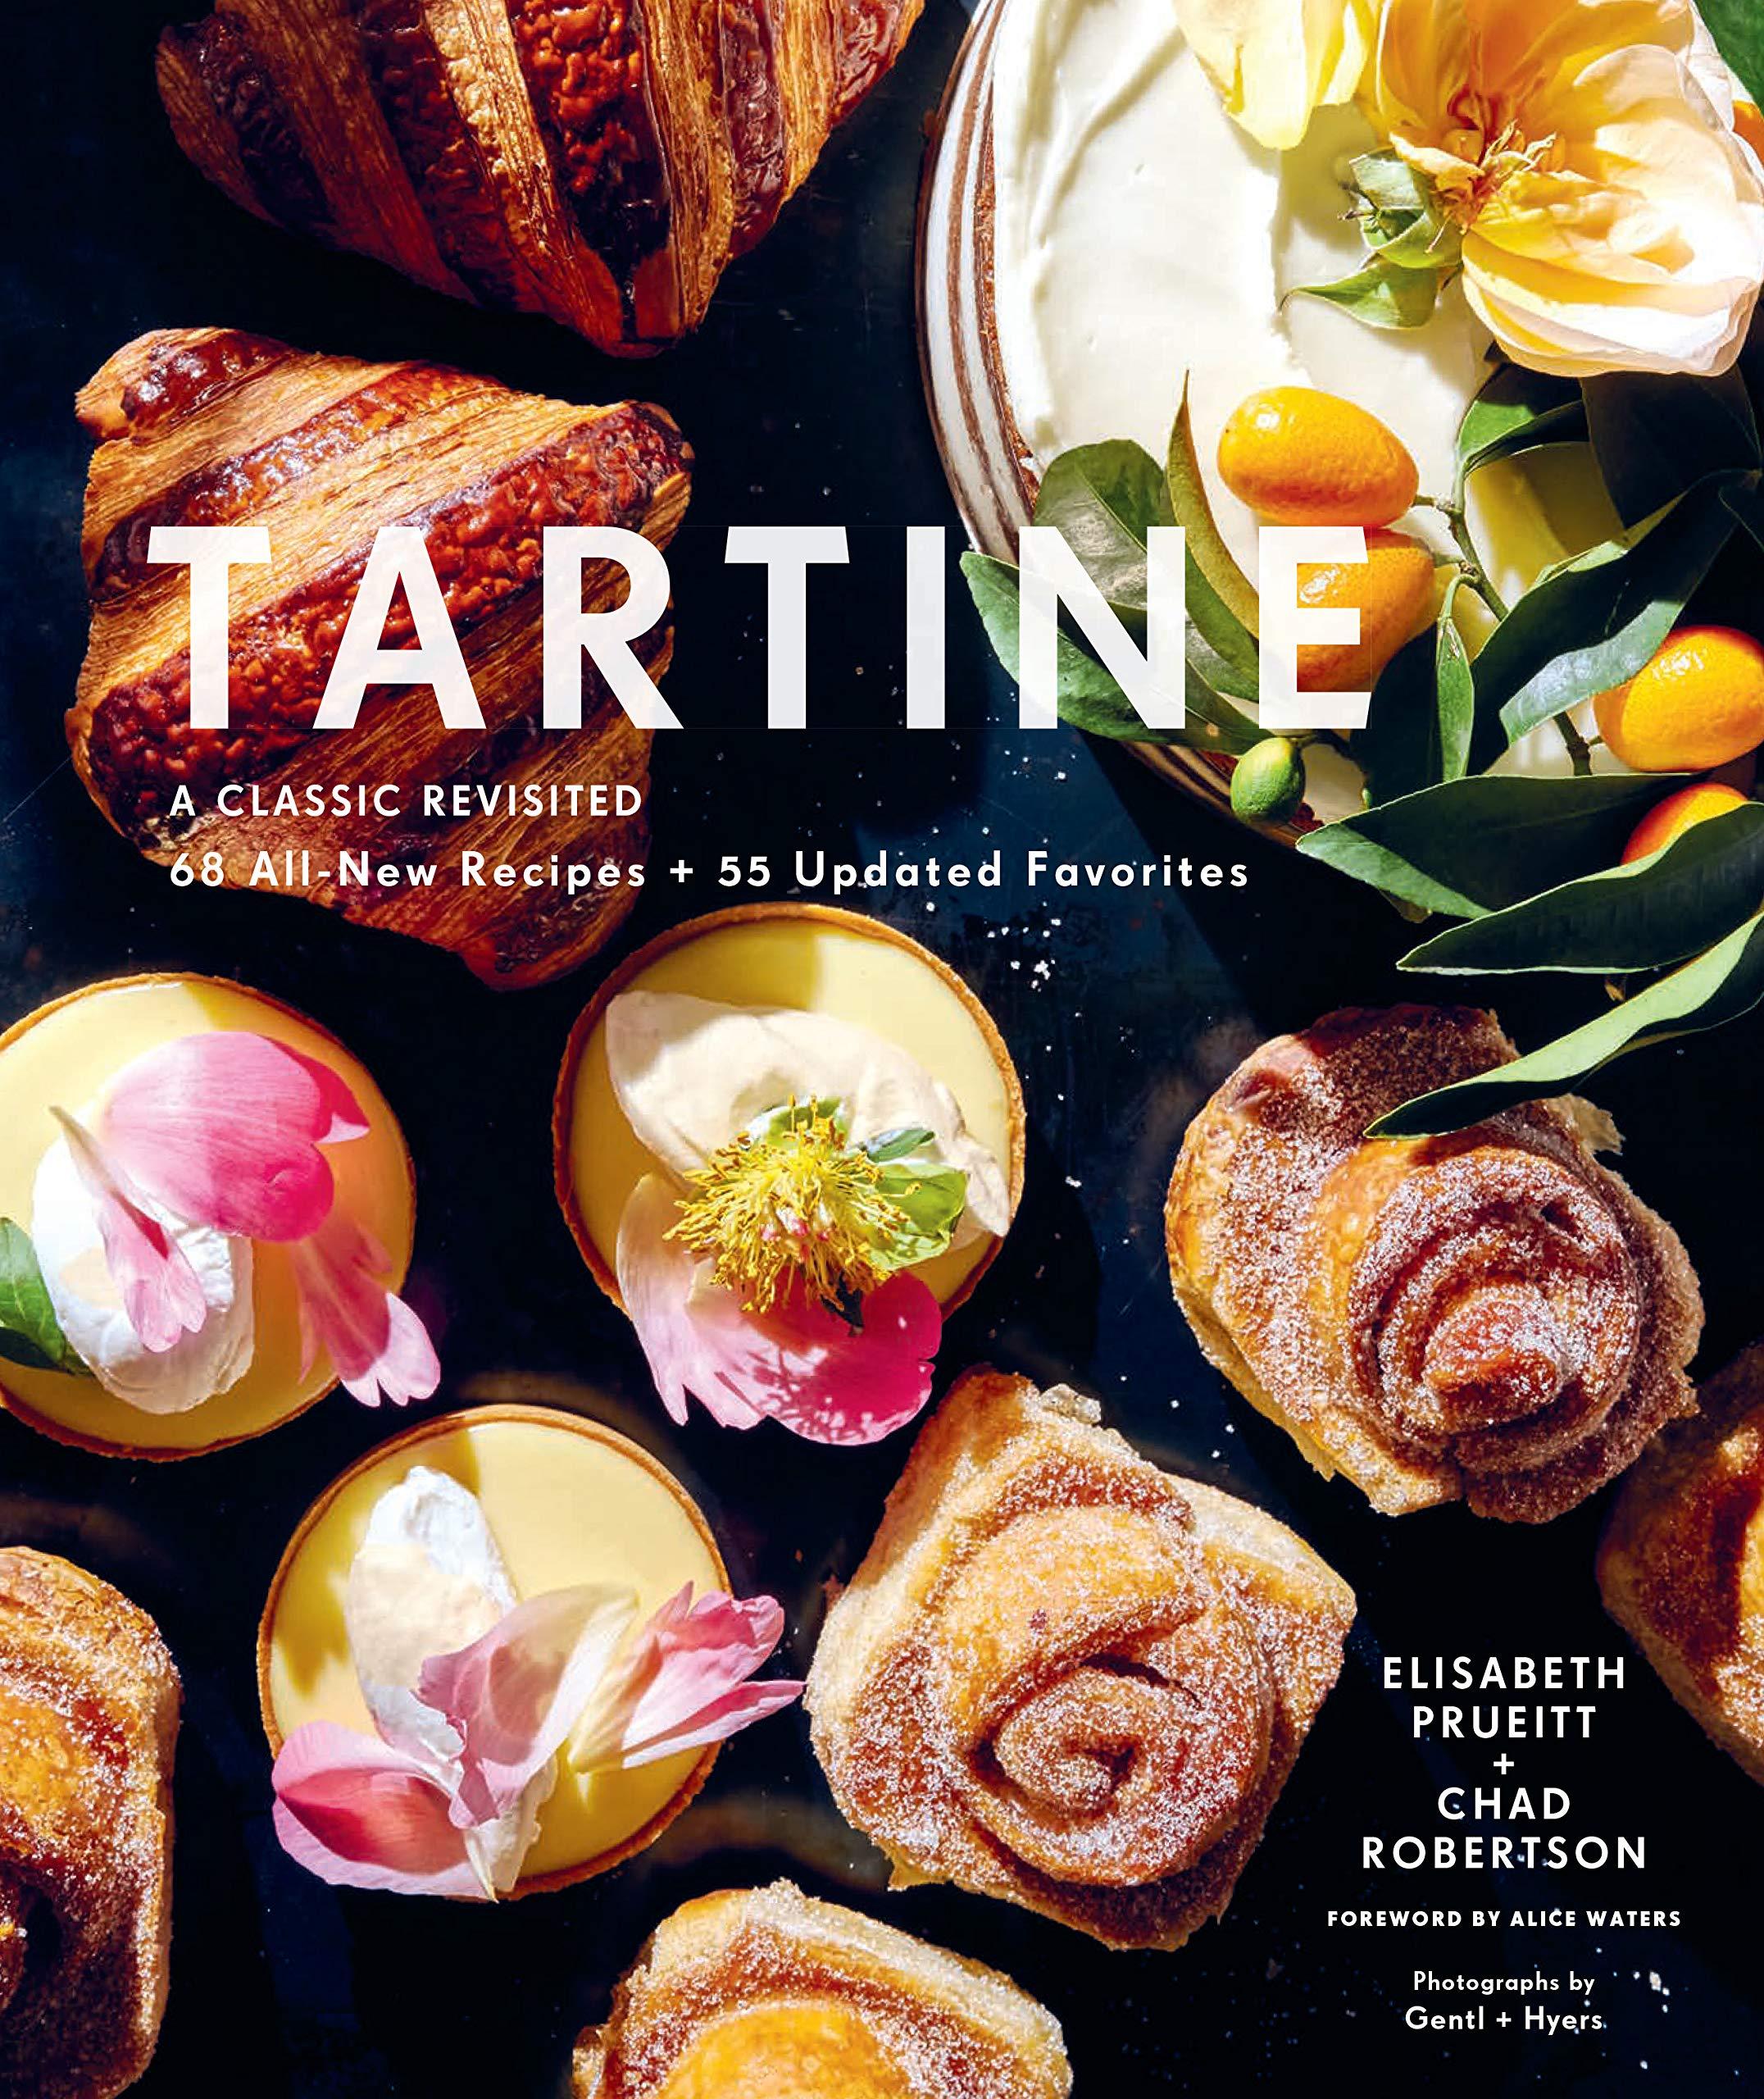 Tartine Revised Classic Revisited Favorites